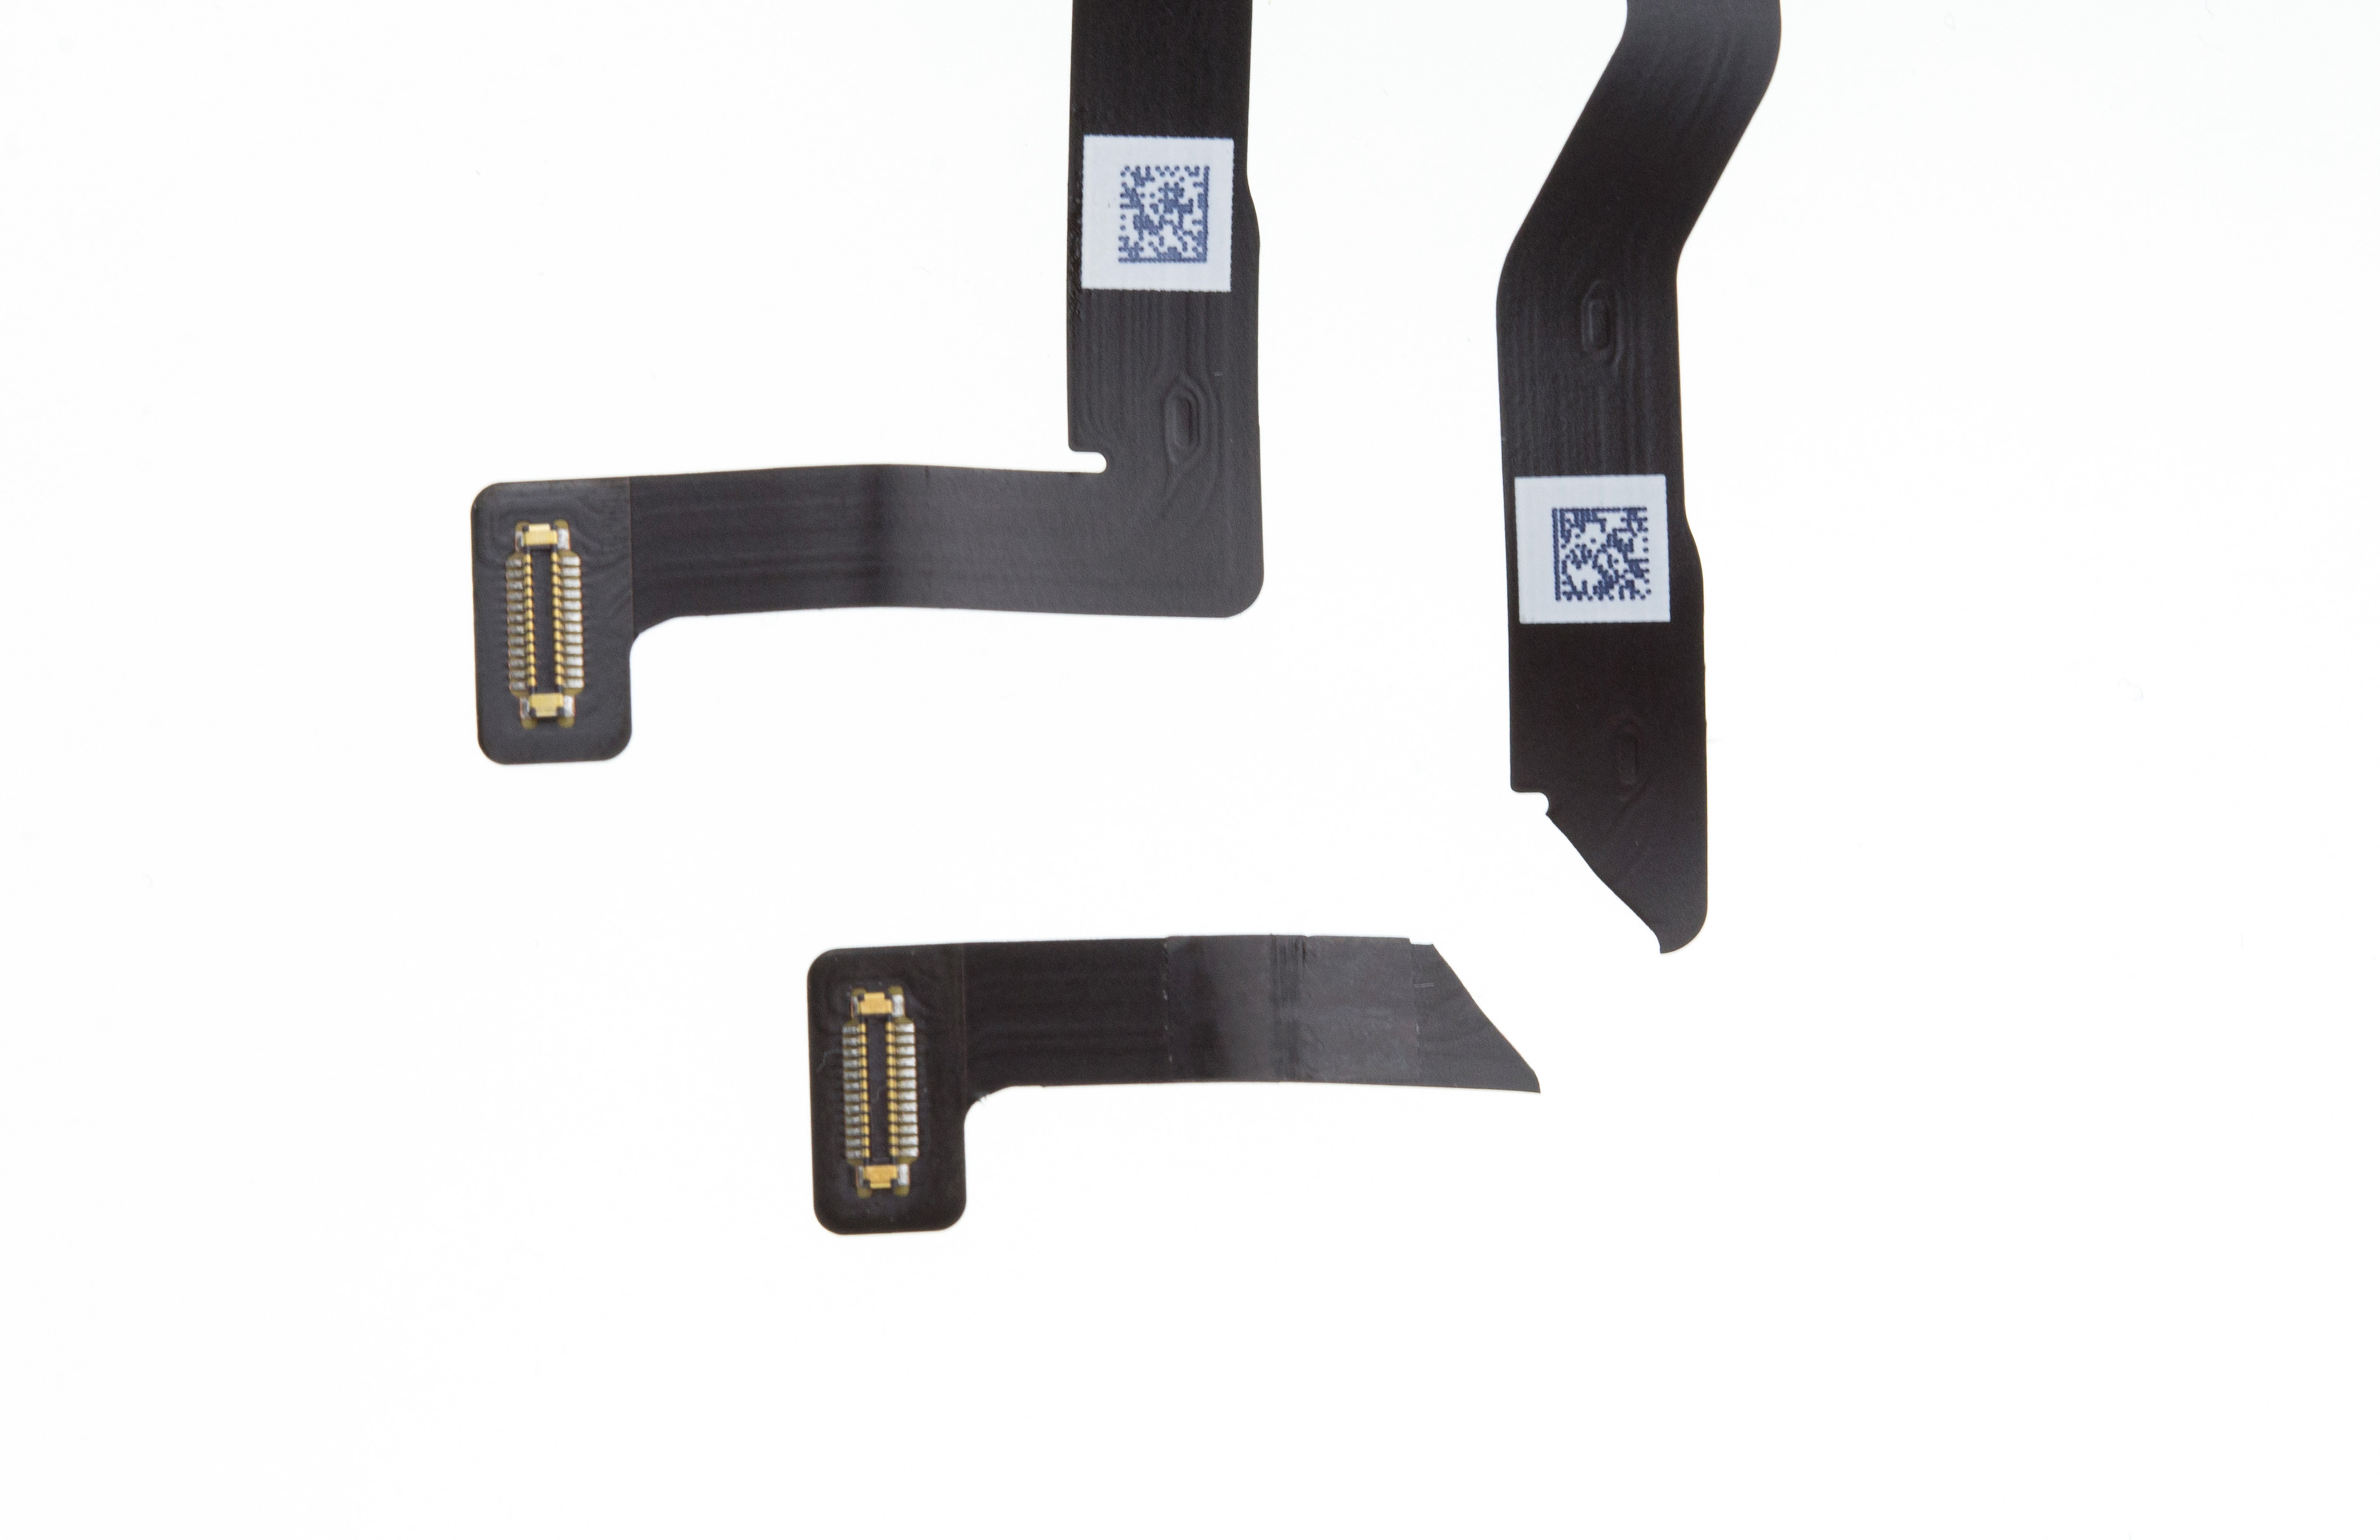 iphone 7 home button 3d touch defekt nach displaytausch l sung idoc. Black Bedroom Furniture Sets. Home Design Ideas